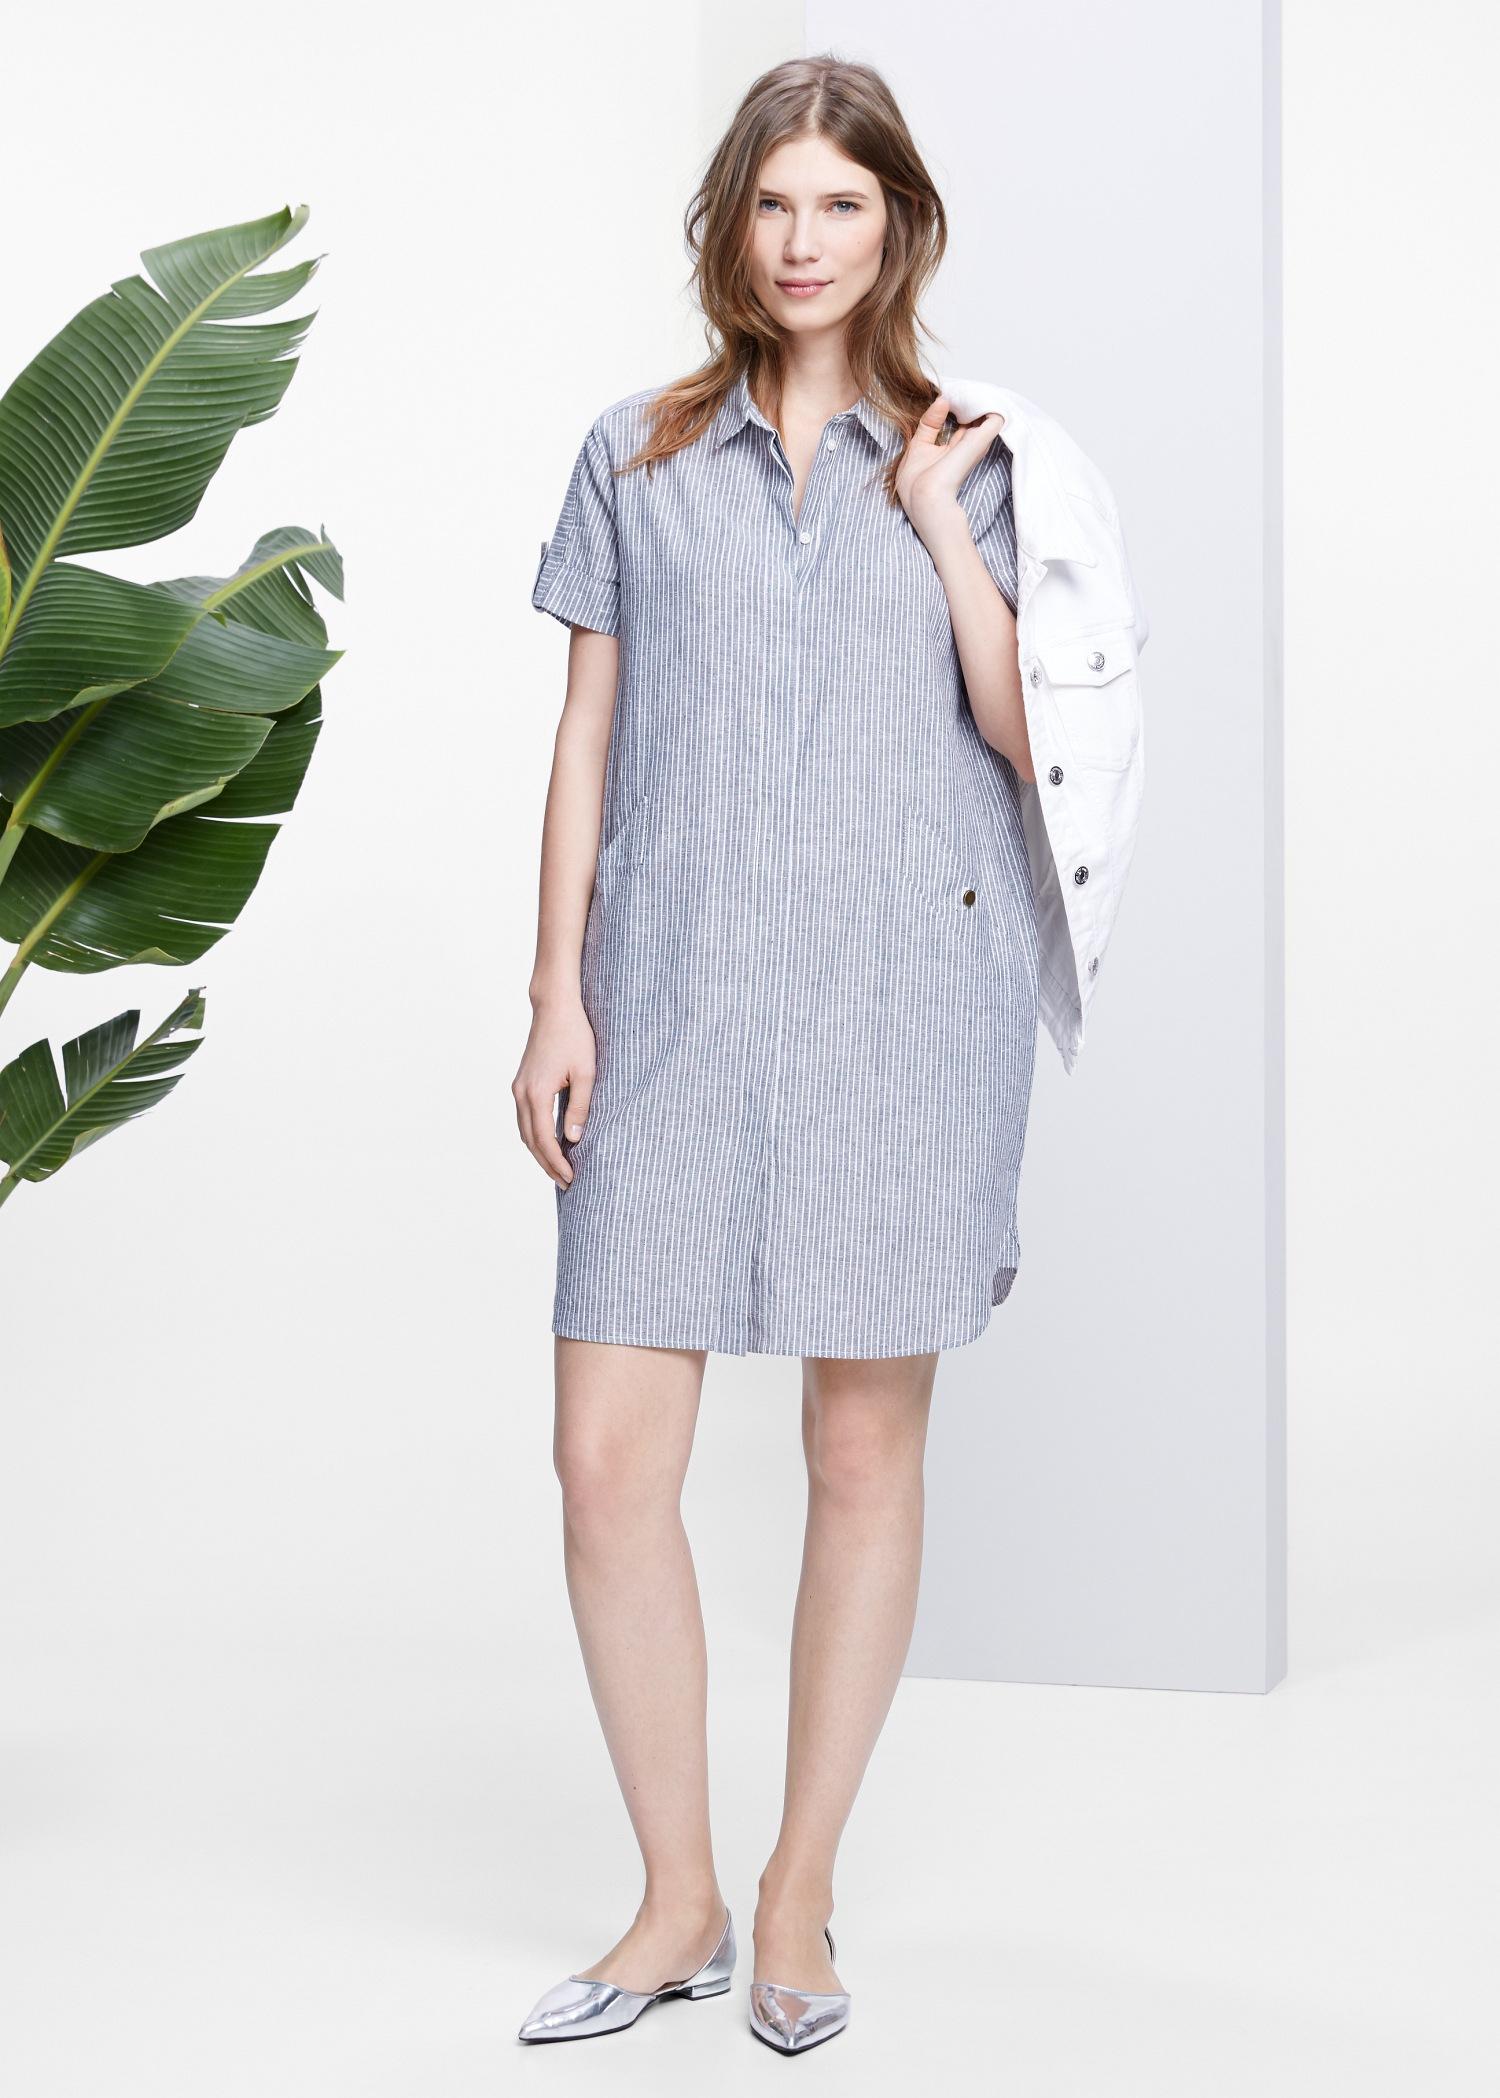 dd06a917e2 Lyst - Violeta by Mango Striped Linen-Blend Dress in Blue